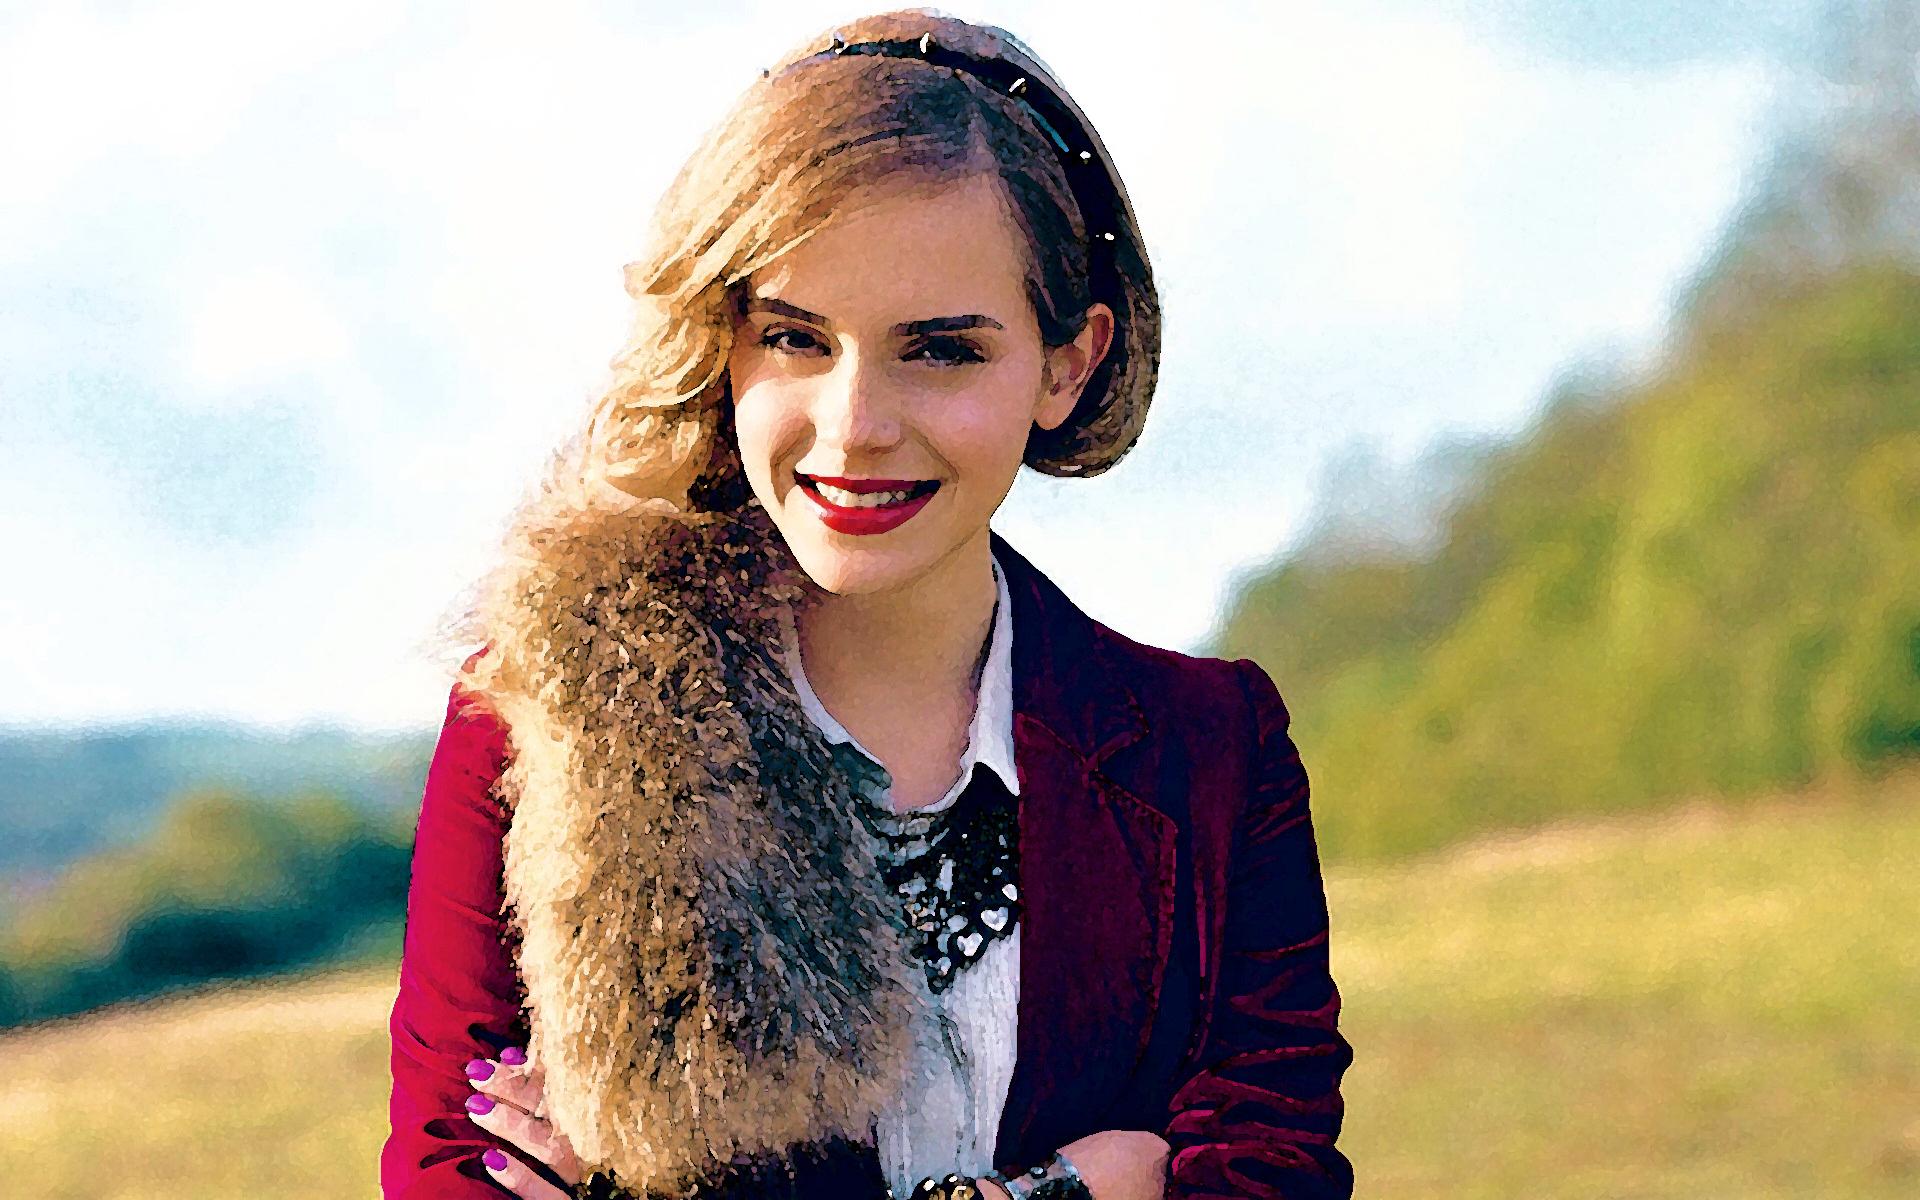 Hd wallpaper real madrid 2017 - Emma Watson Hd Wallpaper 1920x1080 Wallpapersafari